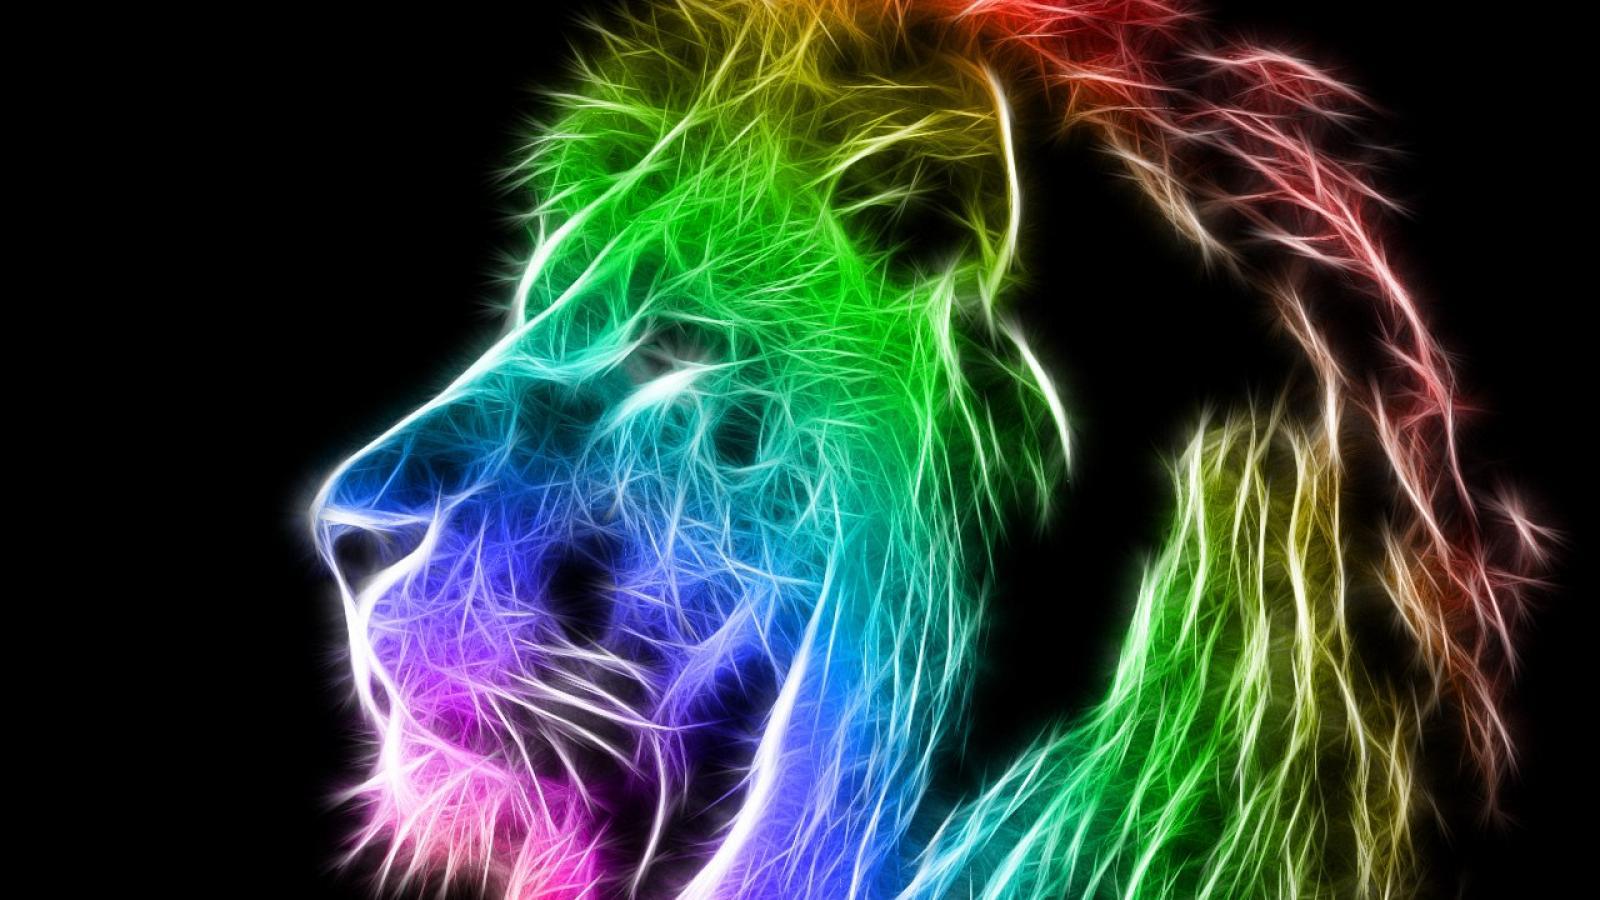 Colorful lion wallpaper 1280x1024 HQ WALLPAPER   44314 1600x900